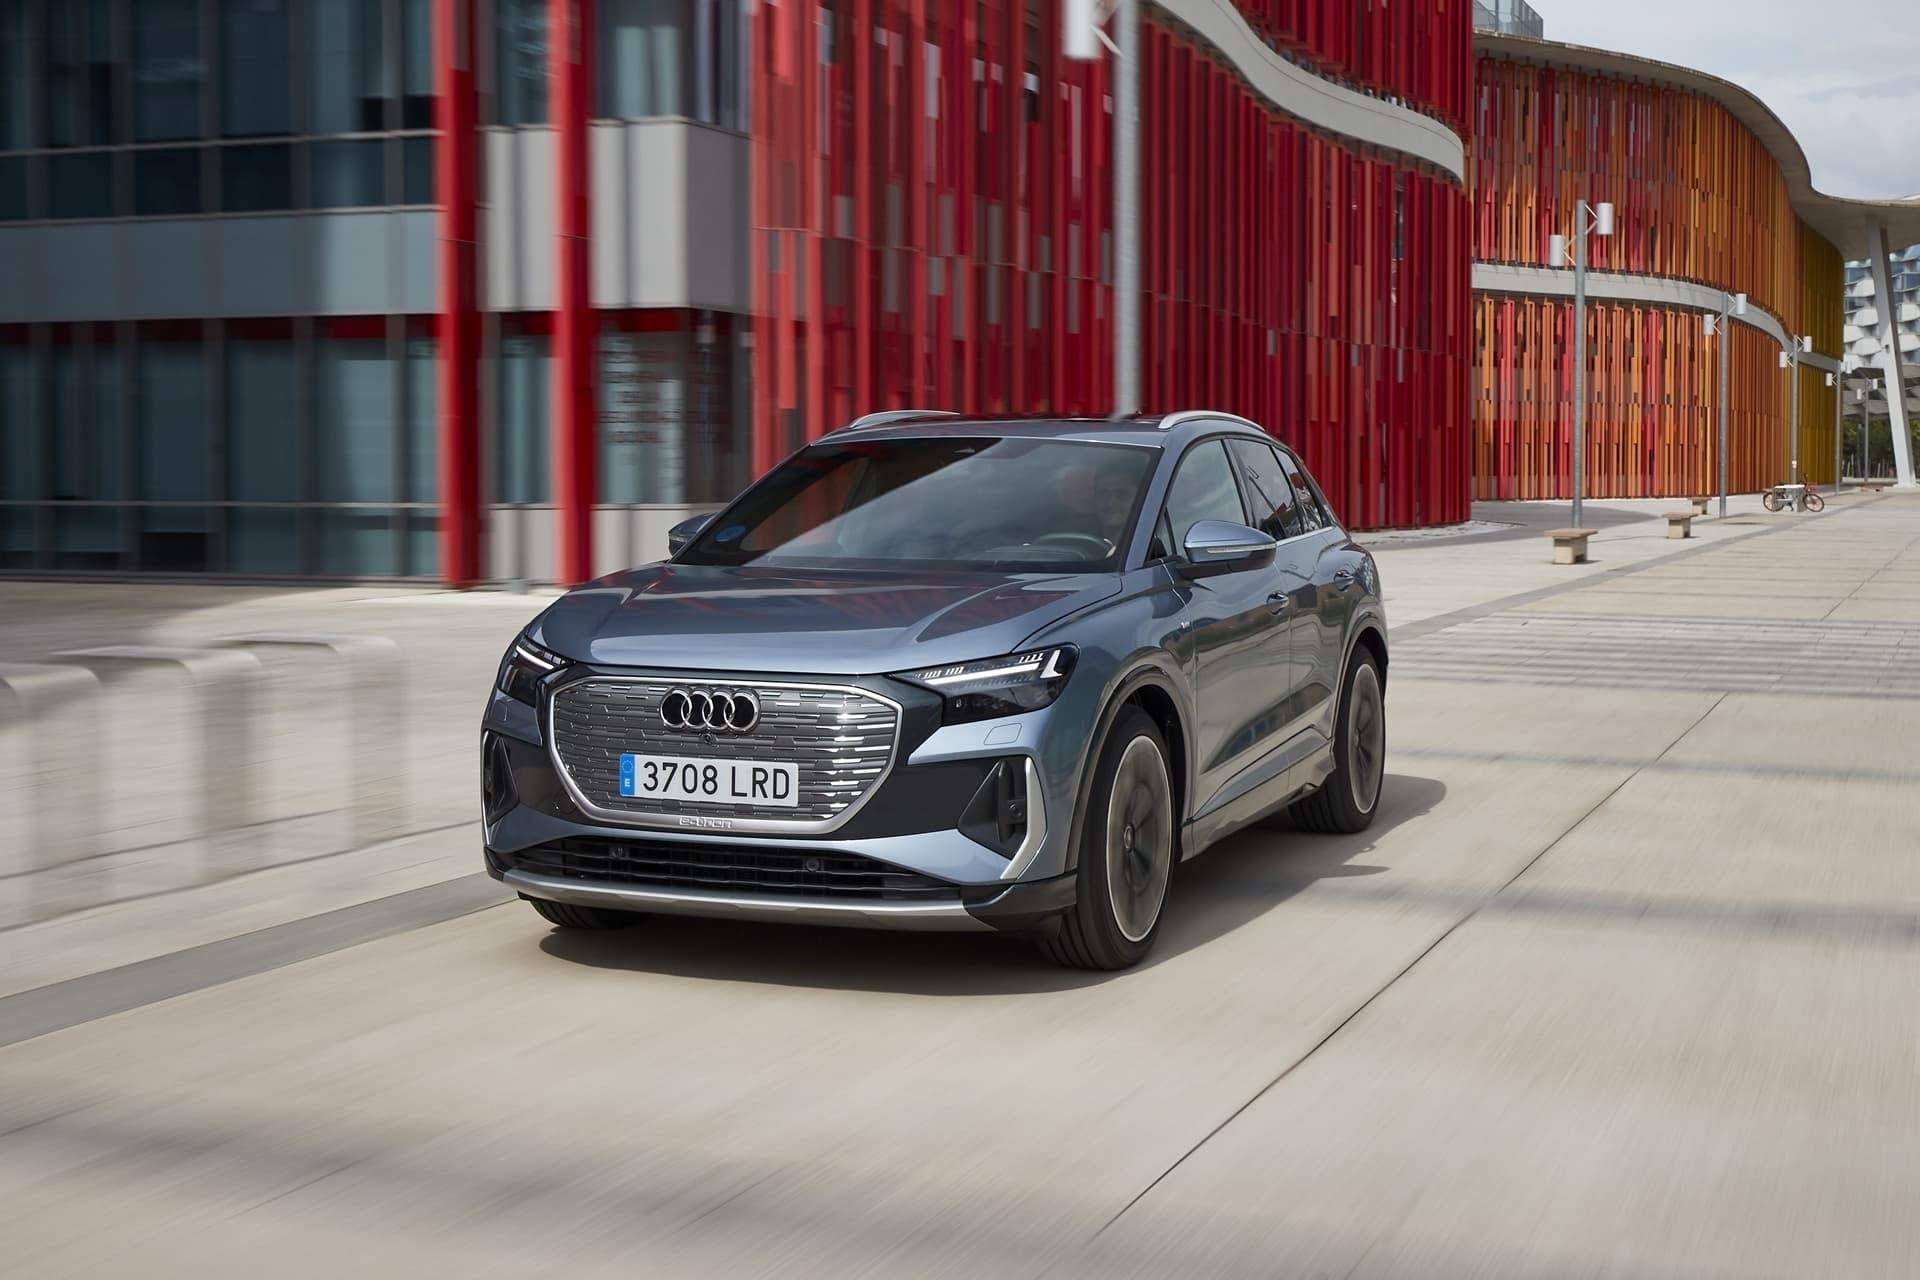 Audi Q4 E Tron 2021 0721 019